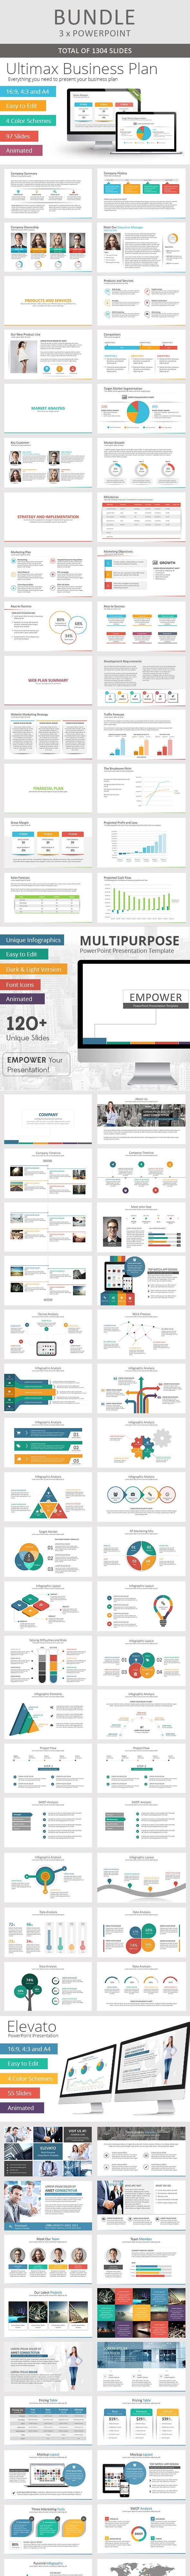 3 x Multi-Purpose PowerPoint Bundle - Business PowerPoint Templates